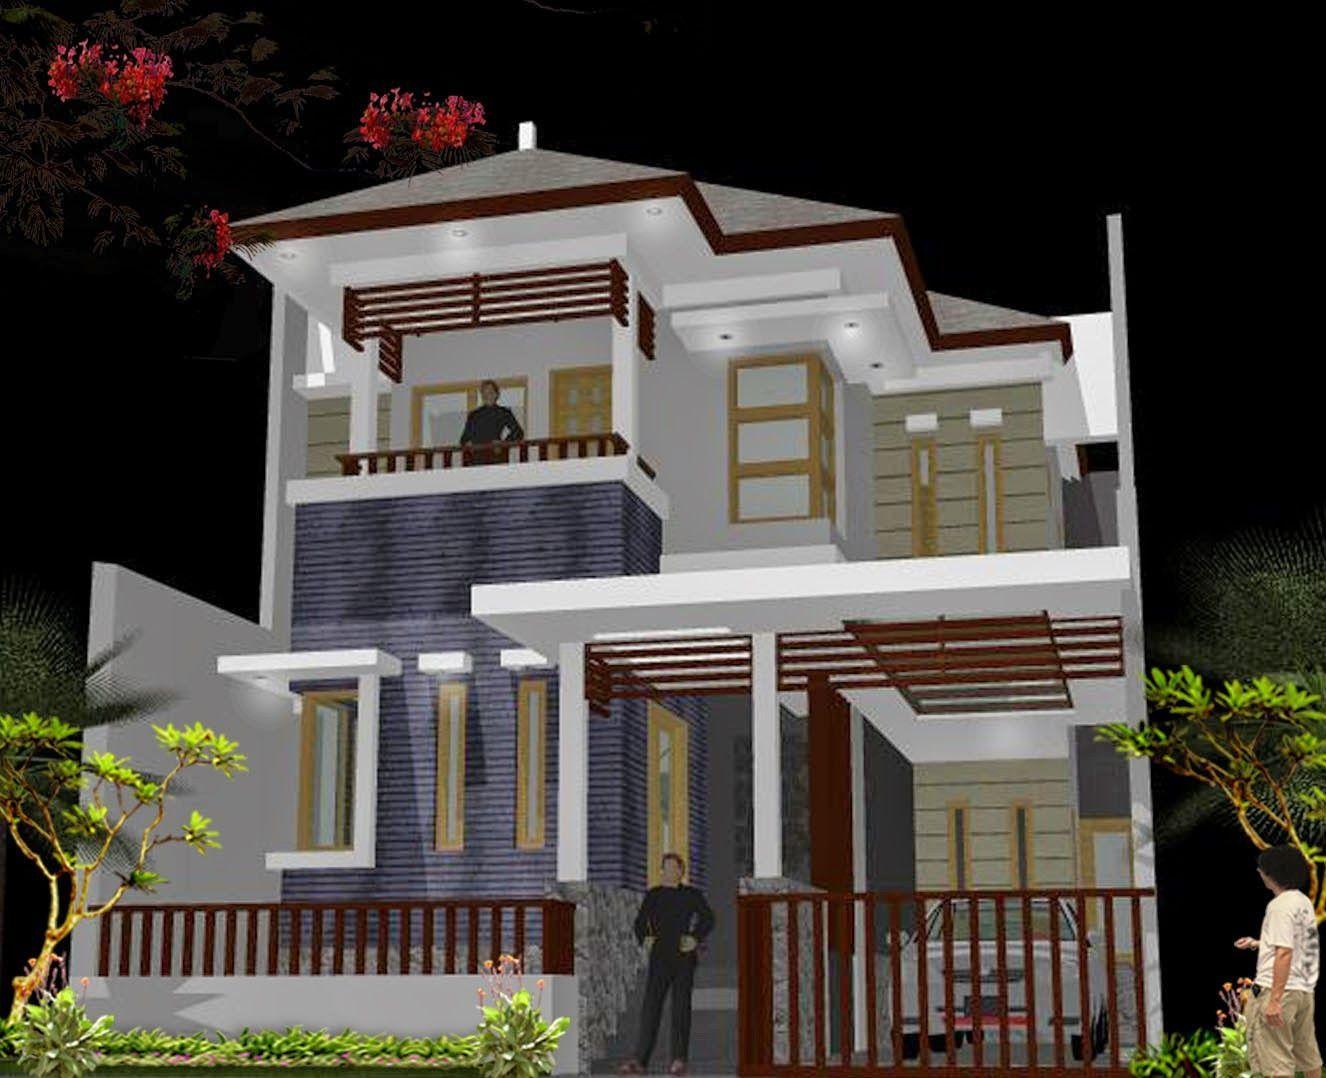 Desain Rumah Minimalis Artis Indonesia Check more at ://desainrumahkita.net/ & Desain Rumah Minimalis Artis Indonesia Check more at http ...